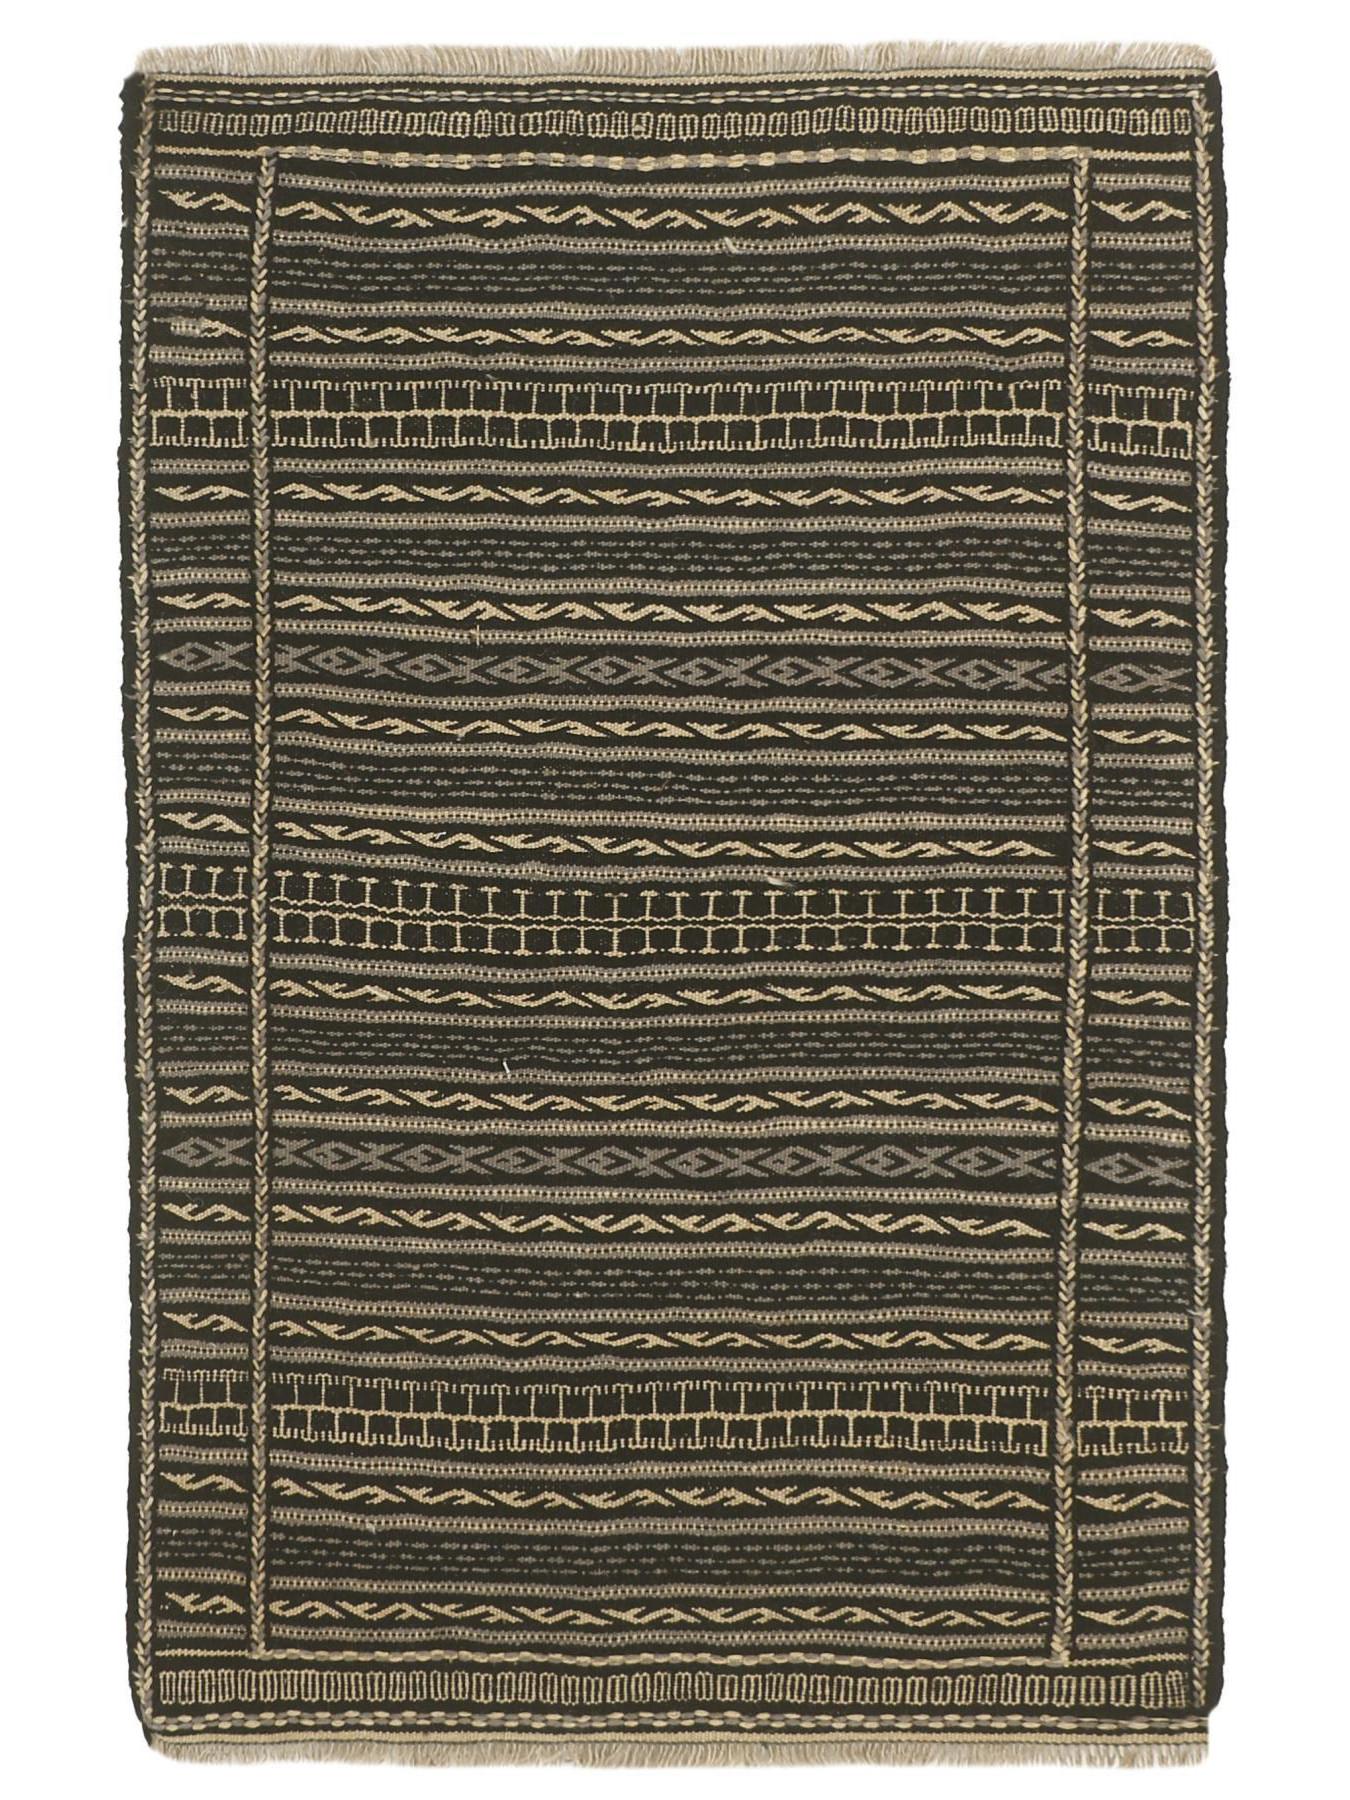 Kilims traditionnels - Kilim Zili